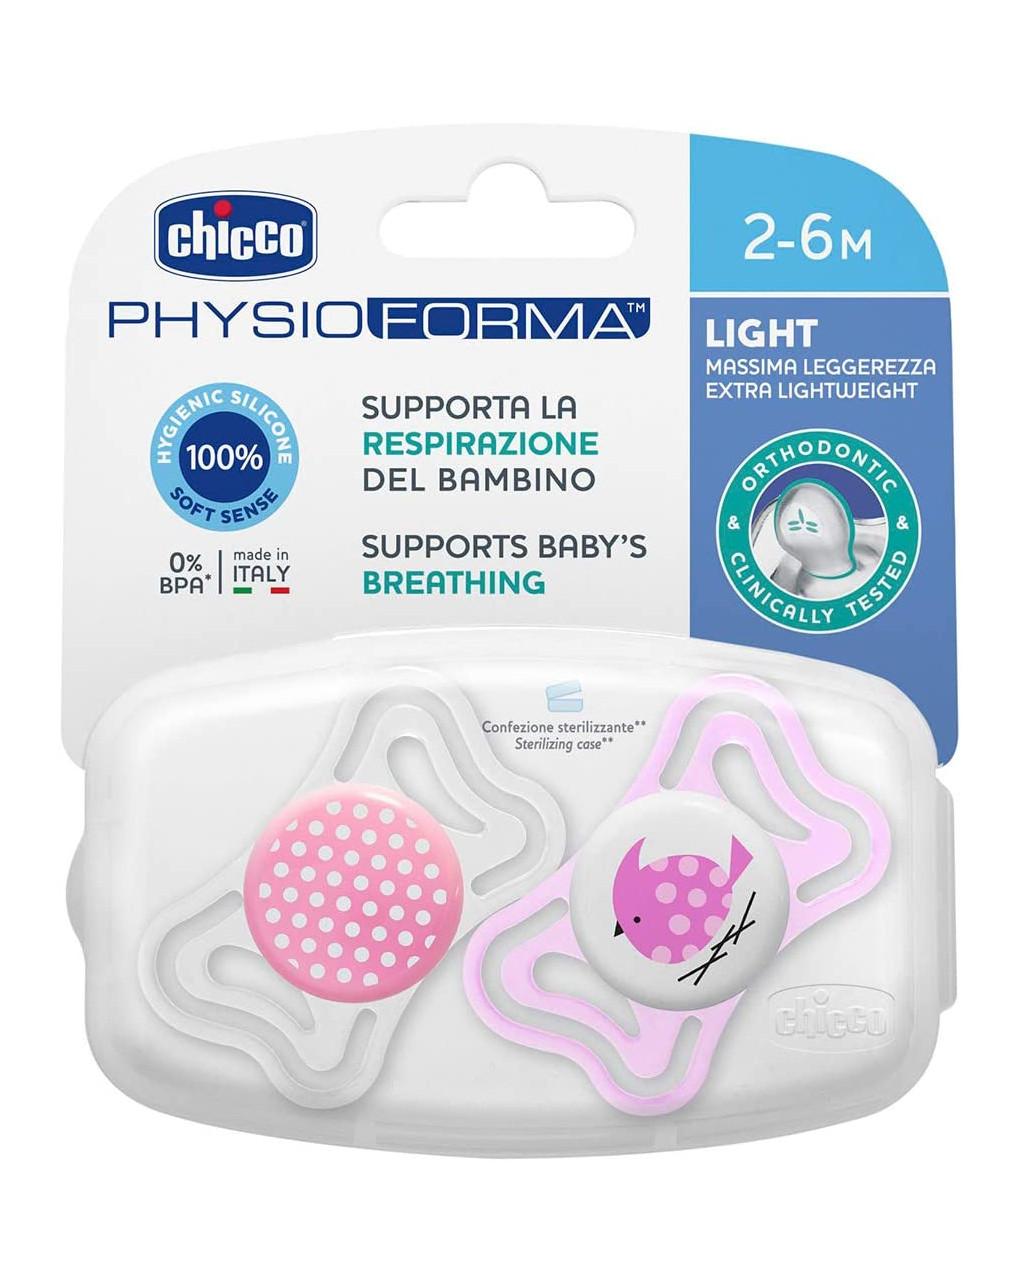 Succhietto chicco light 2-6 mesi bimba - 2 pz - Chicco